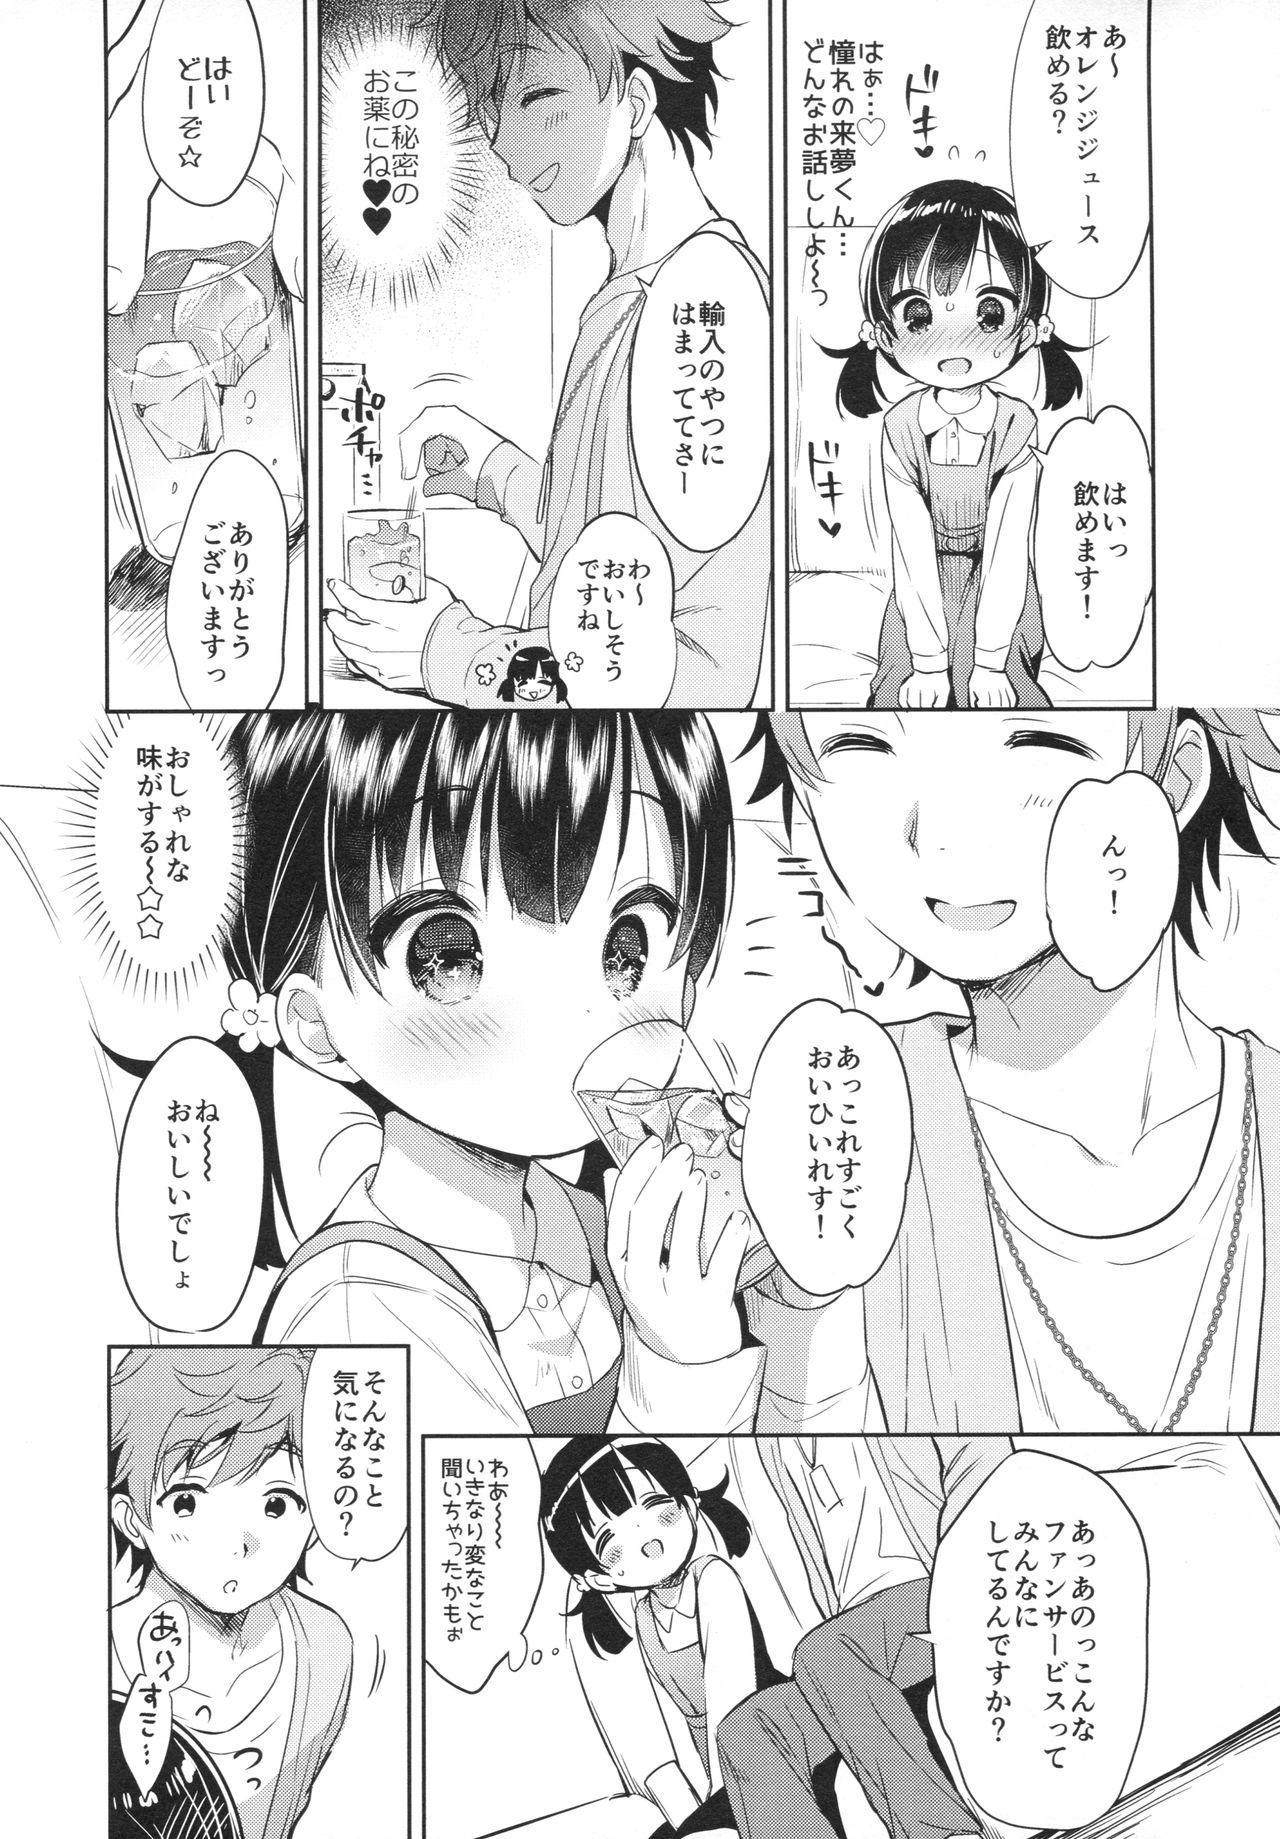 Dokumo Lime CASE FILE 2 10